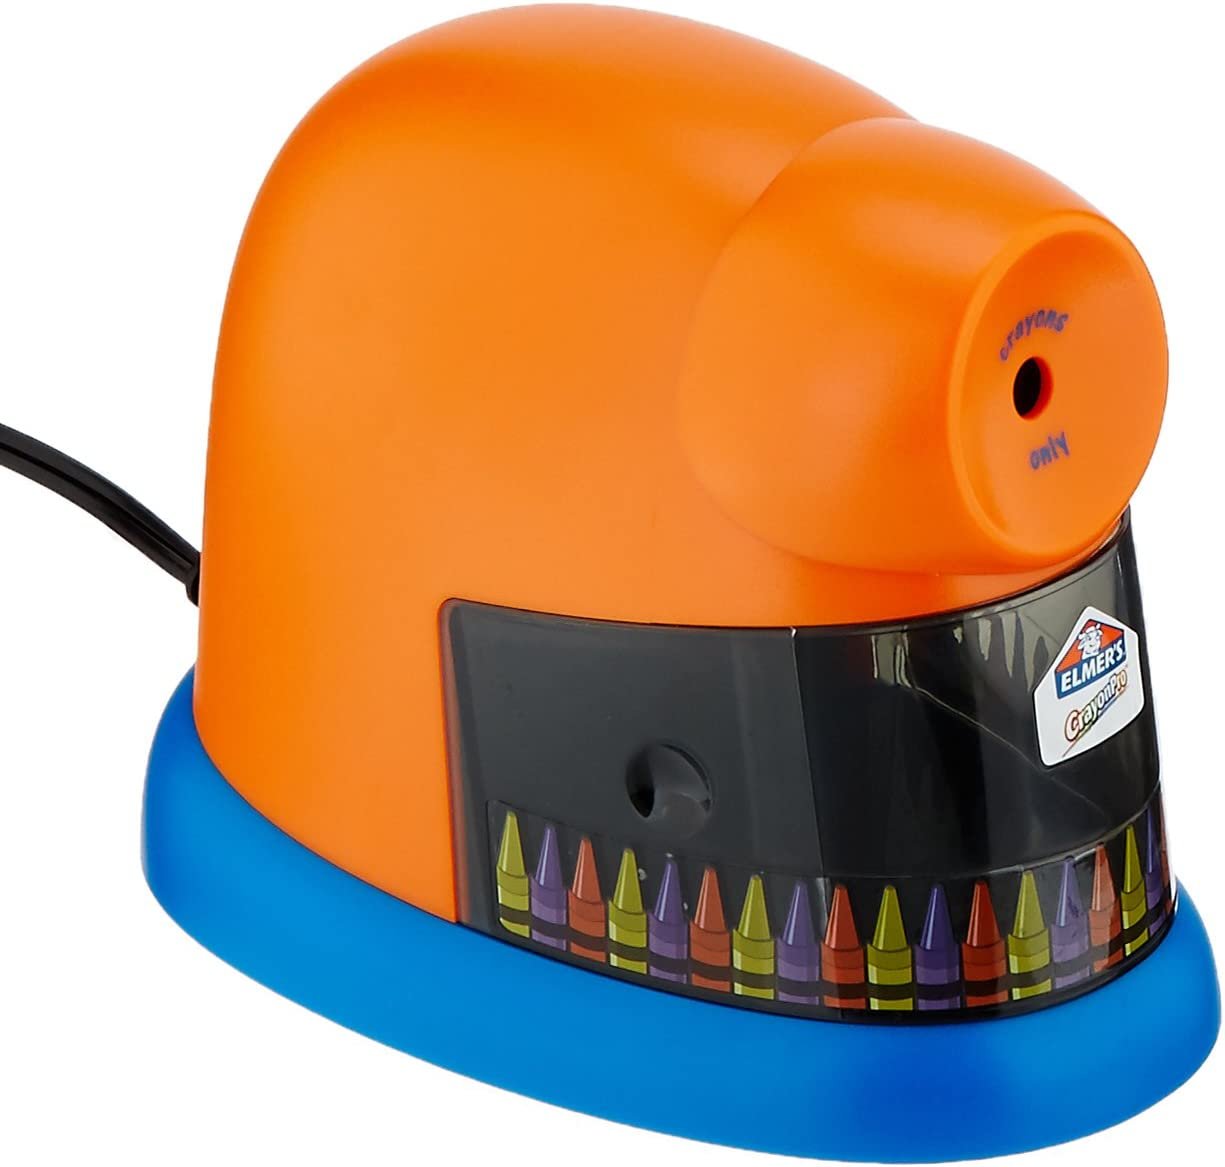 Elmer's Crayon Sharpener 61so6gYis2BL